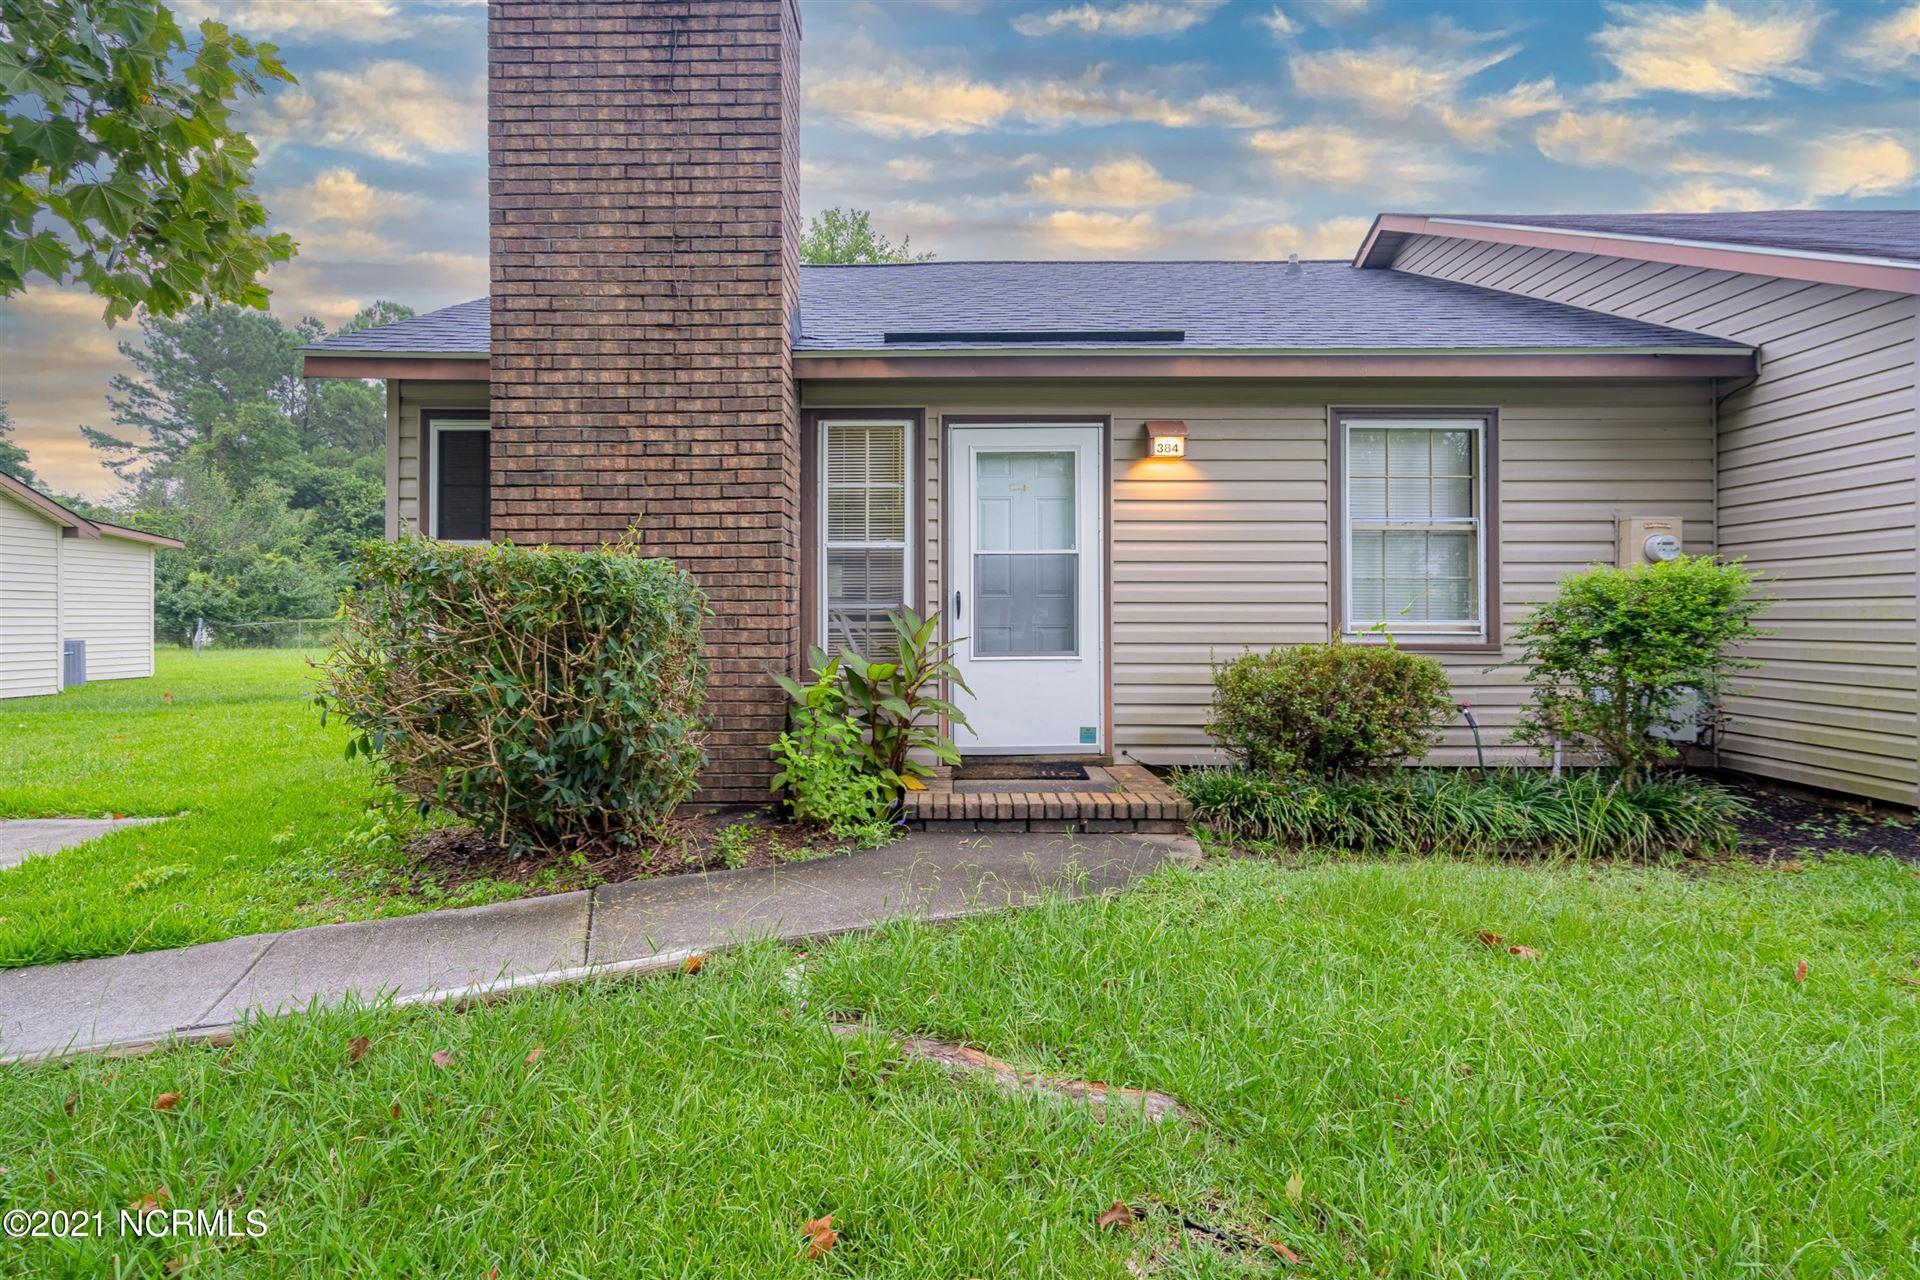 Photo for 384 W Frances Street, Jacksonville, NC 28546 (MLS # 100281412)